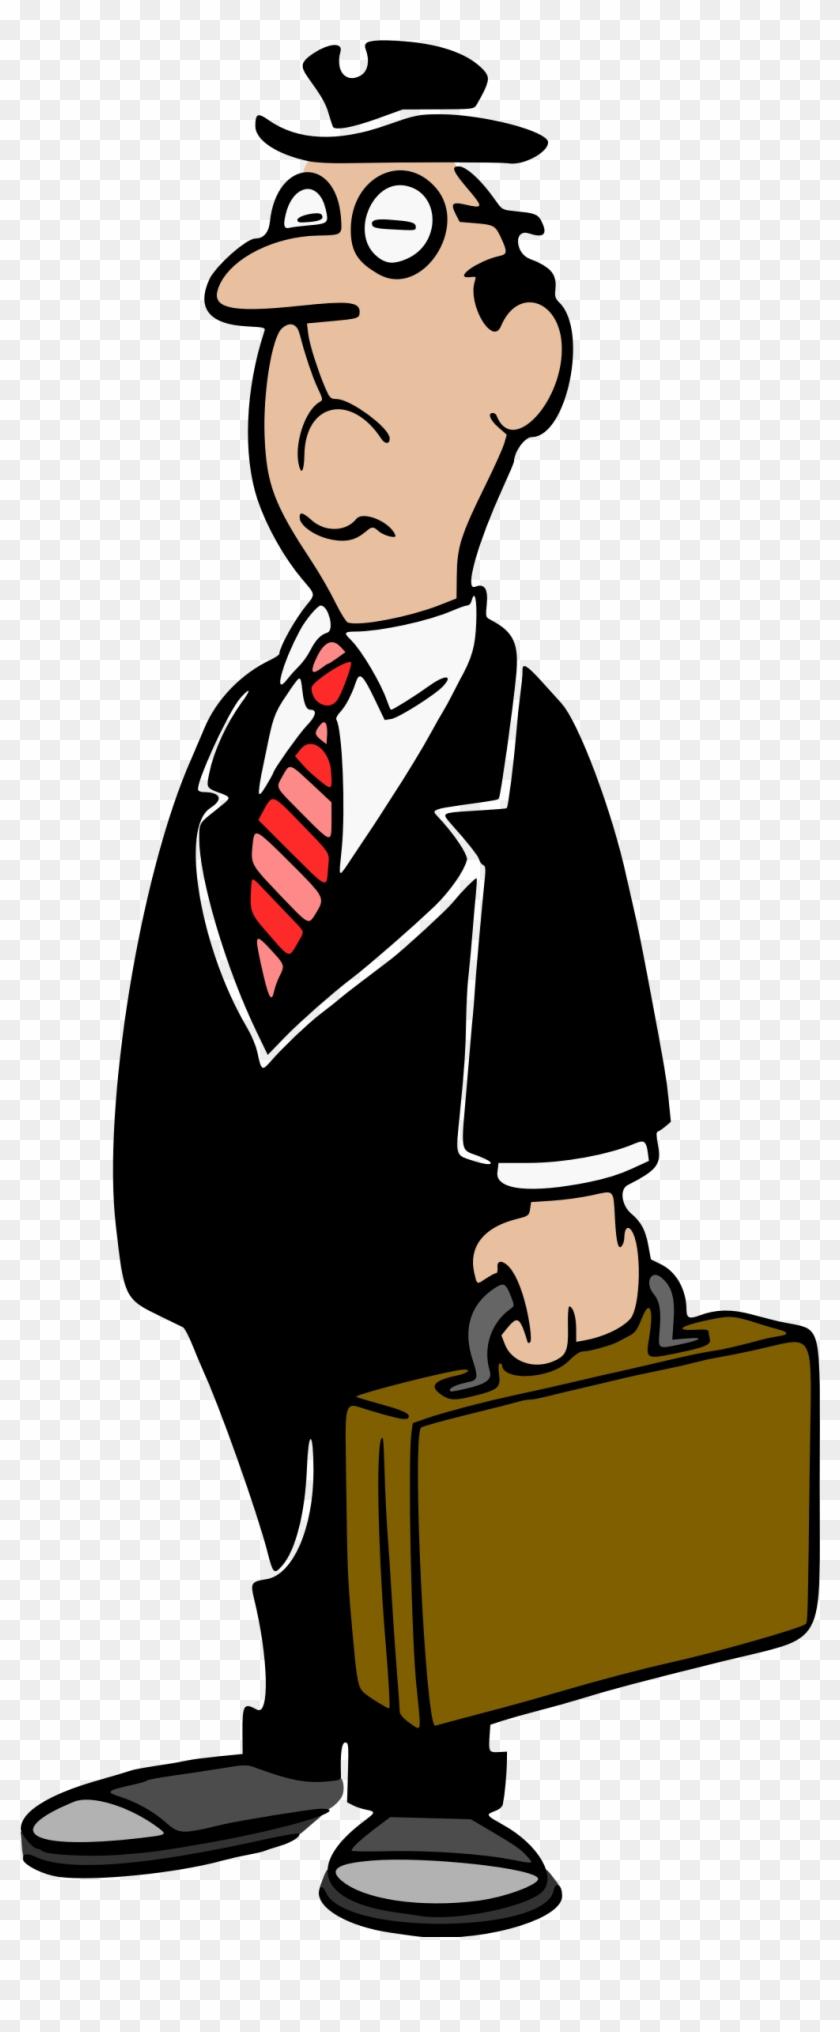 Big Image - Businessman Clipart #126307